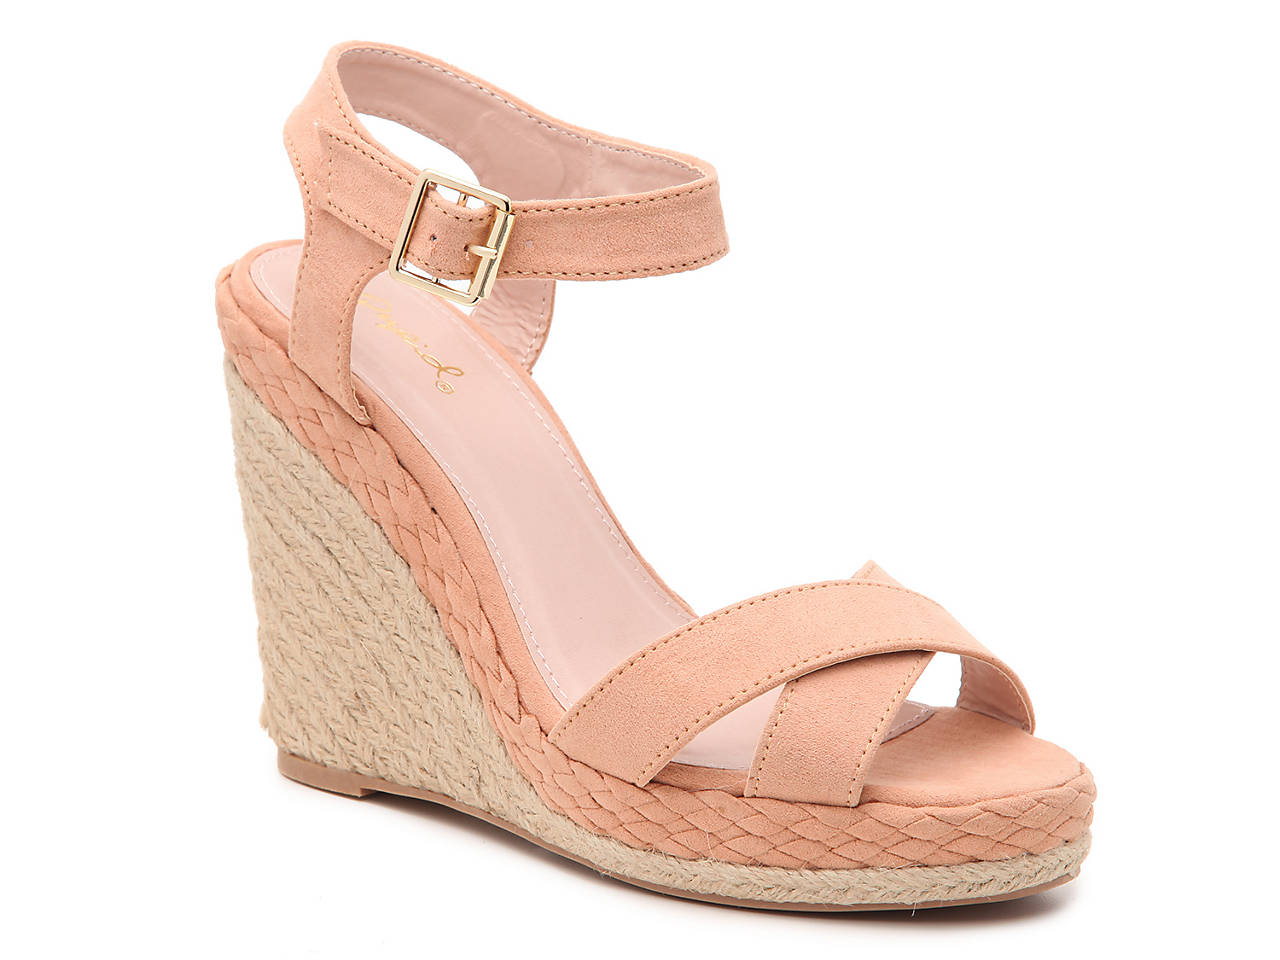 72f87bba1ef Qupid Elara-08 Espadrille Wedge Sandal Women s Shoes